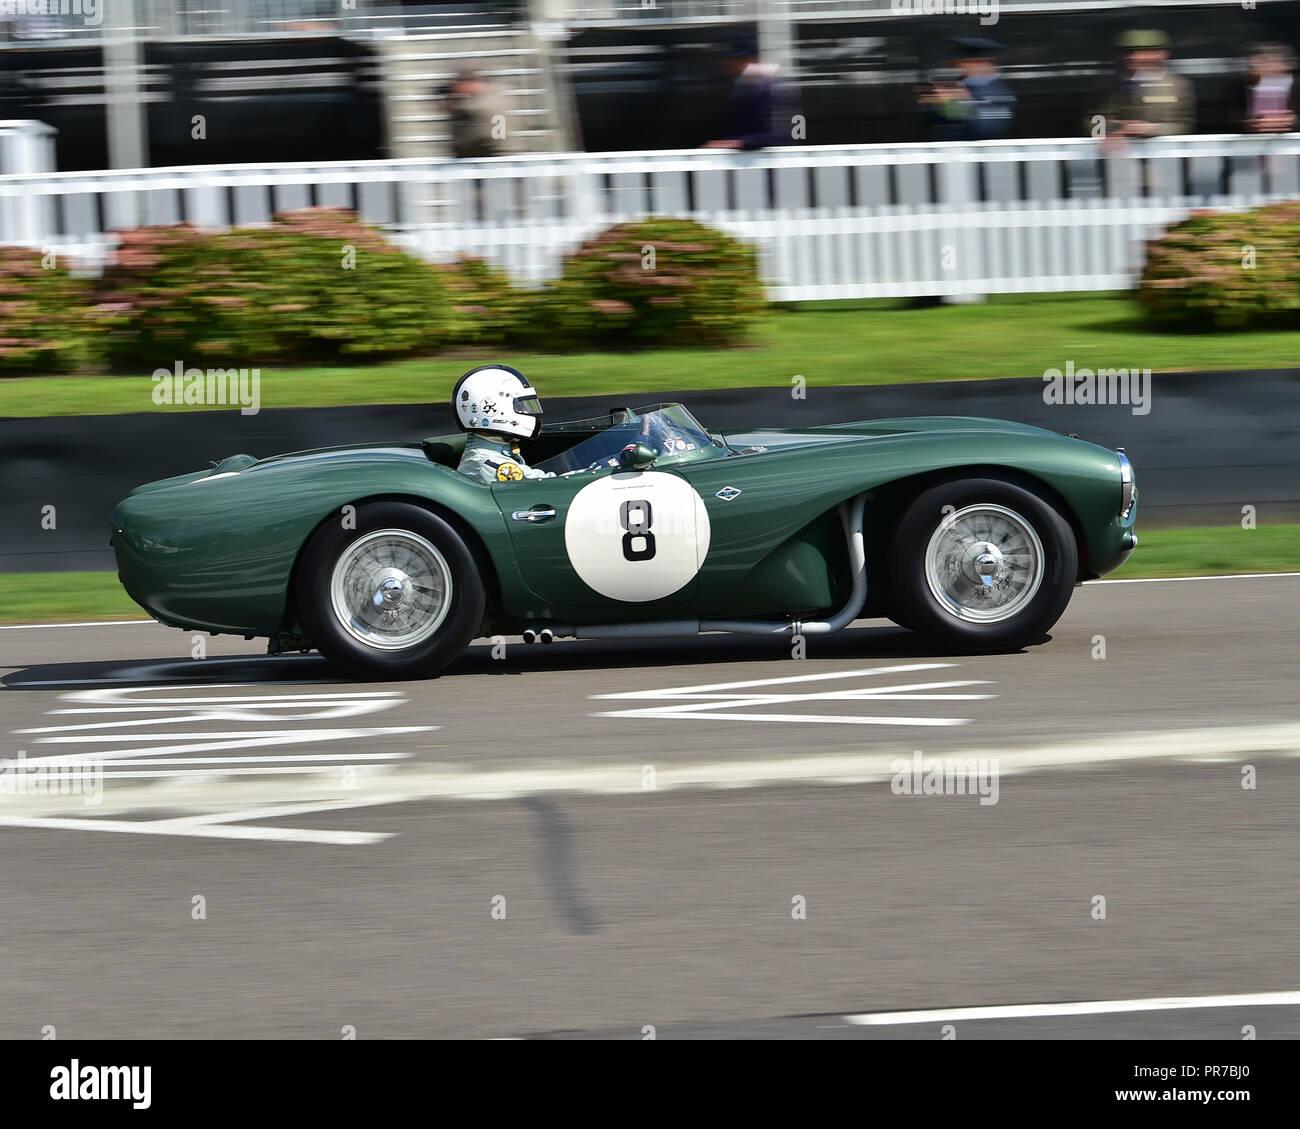 Peter Bradfield, Aston Martin DB 3 S, Freddie März Memorial Trophy, Sportwagen, 1952 bis 1955, Goodwood Revival 2018, September 2018, Automobile, Autos Stockbild